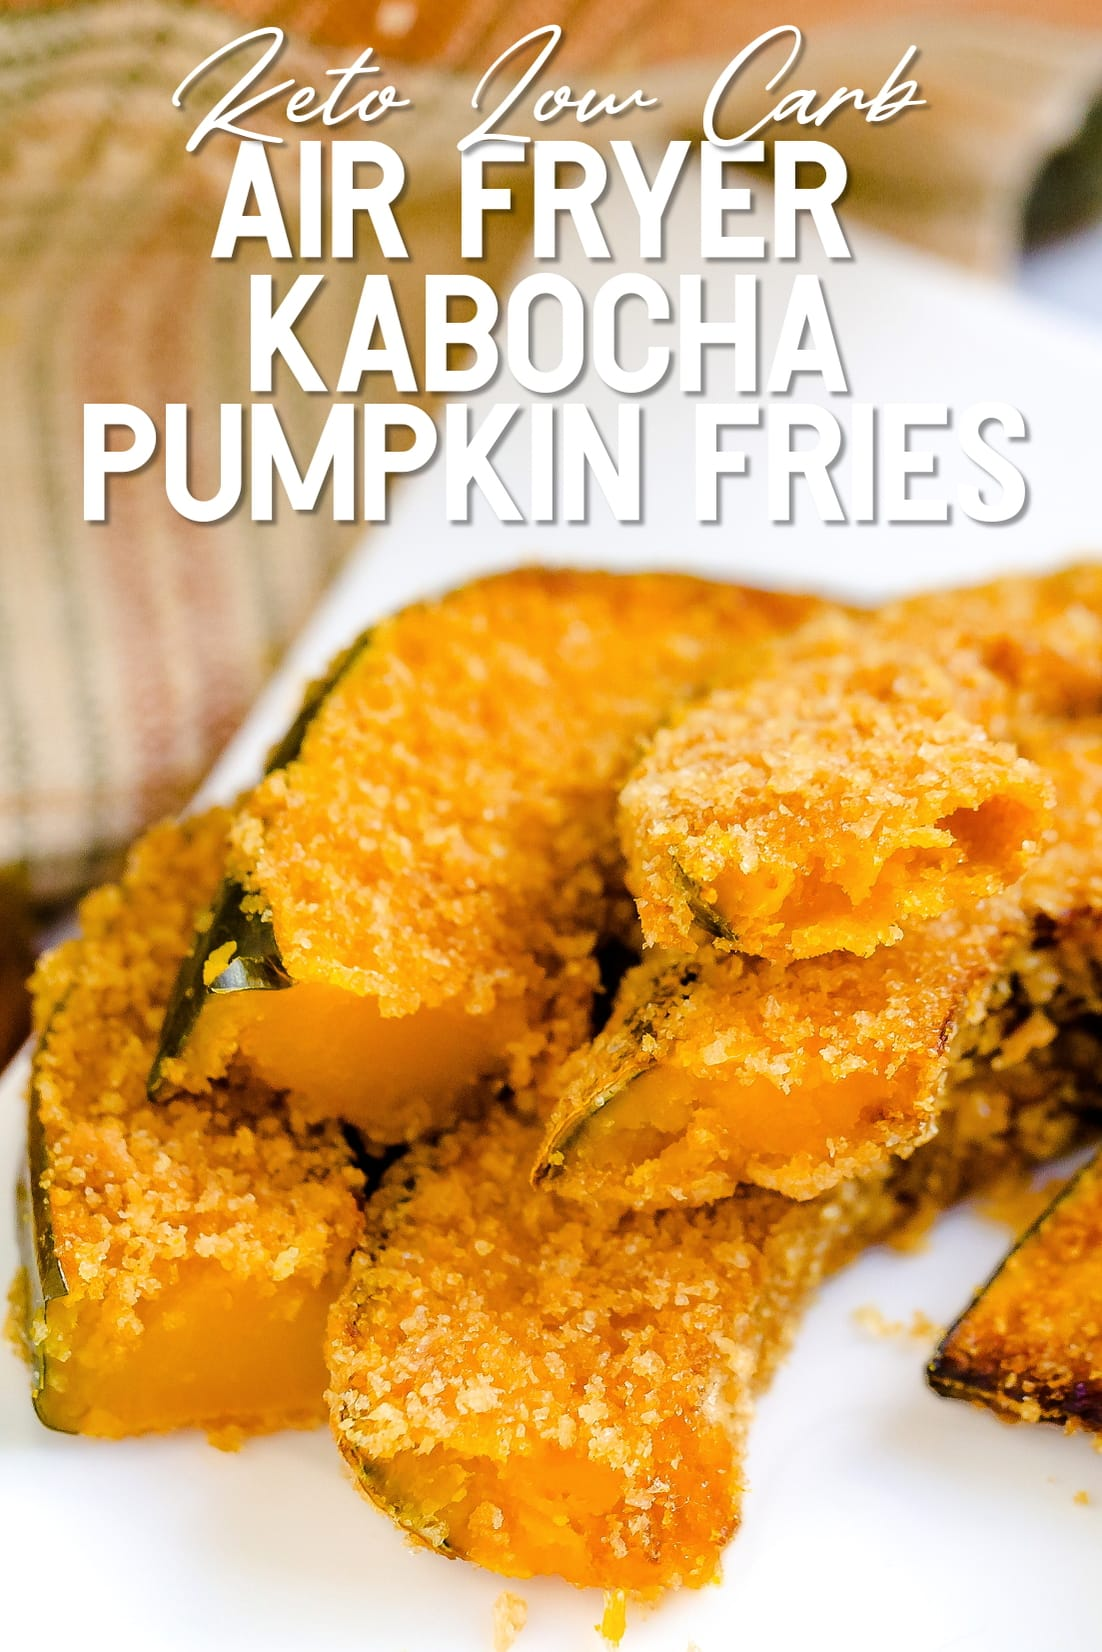 Keto Air Fried Kabocha Pumpkin Fries on serving plate ready to eat